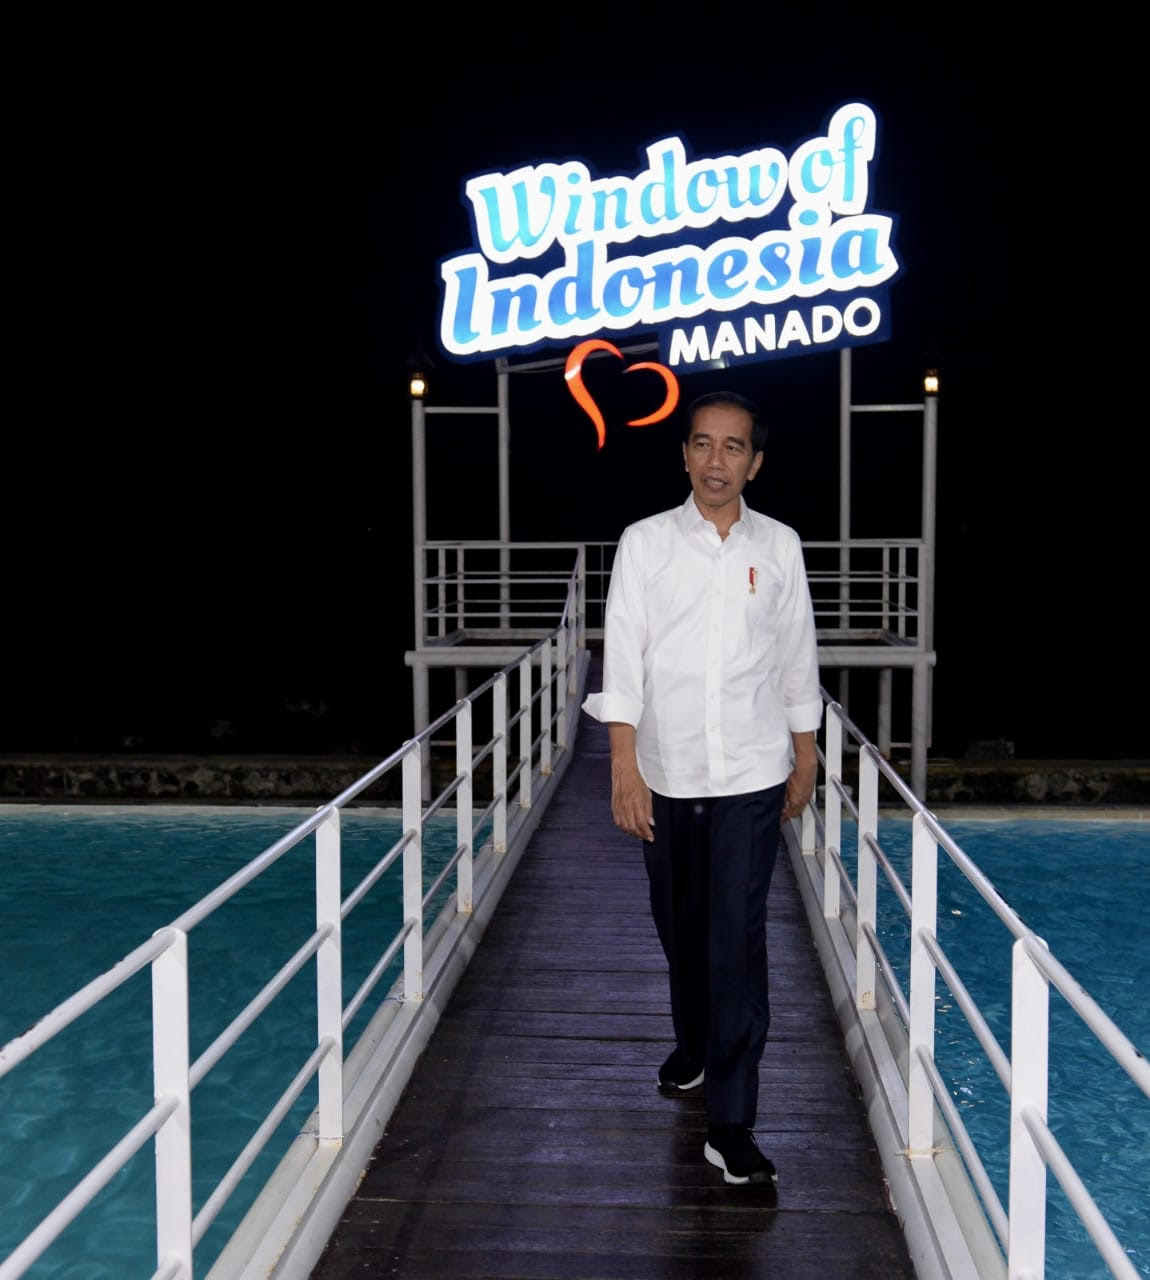 https: img-k.okeinfo.net content 2019 07 05 406 2075007 saat-presiden-jokowi-menikmati-wisata-jendela-indonesia-re6YJbIKBk.jpg